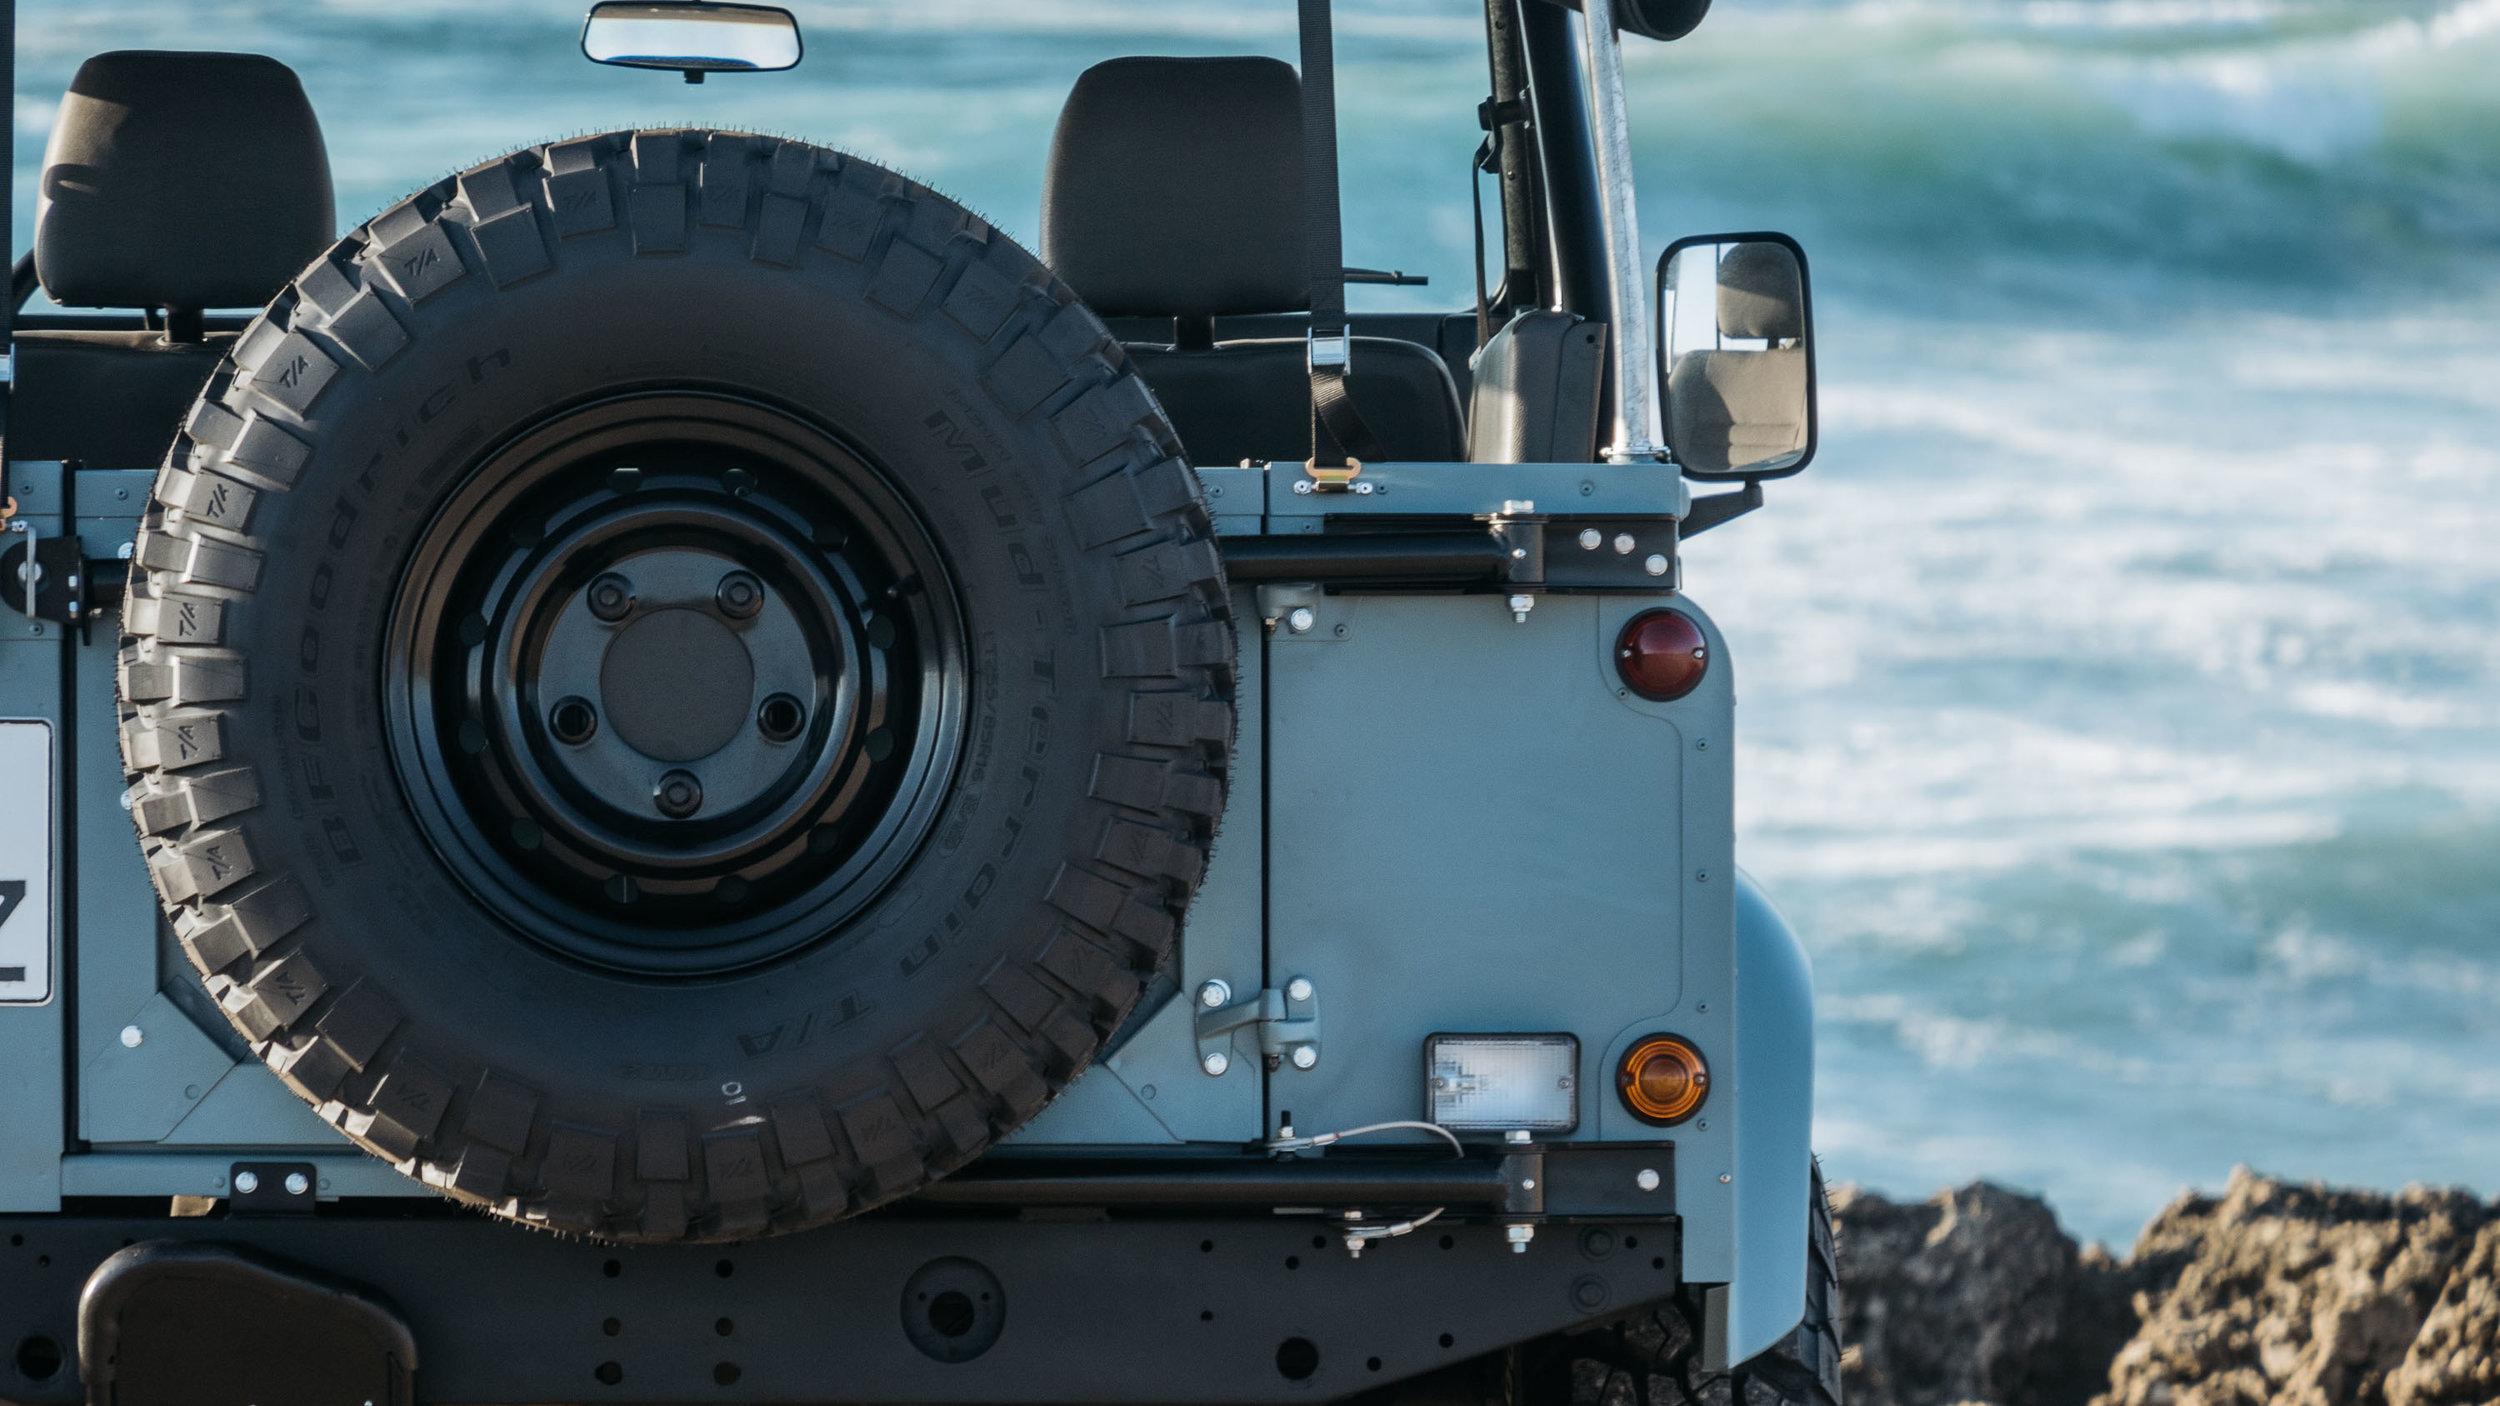 coolnvintage Land Rover Defender (92 of 98).jpg